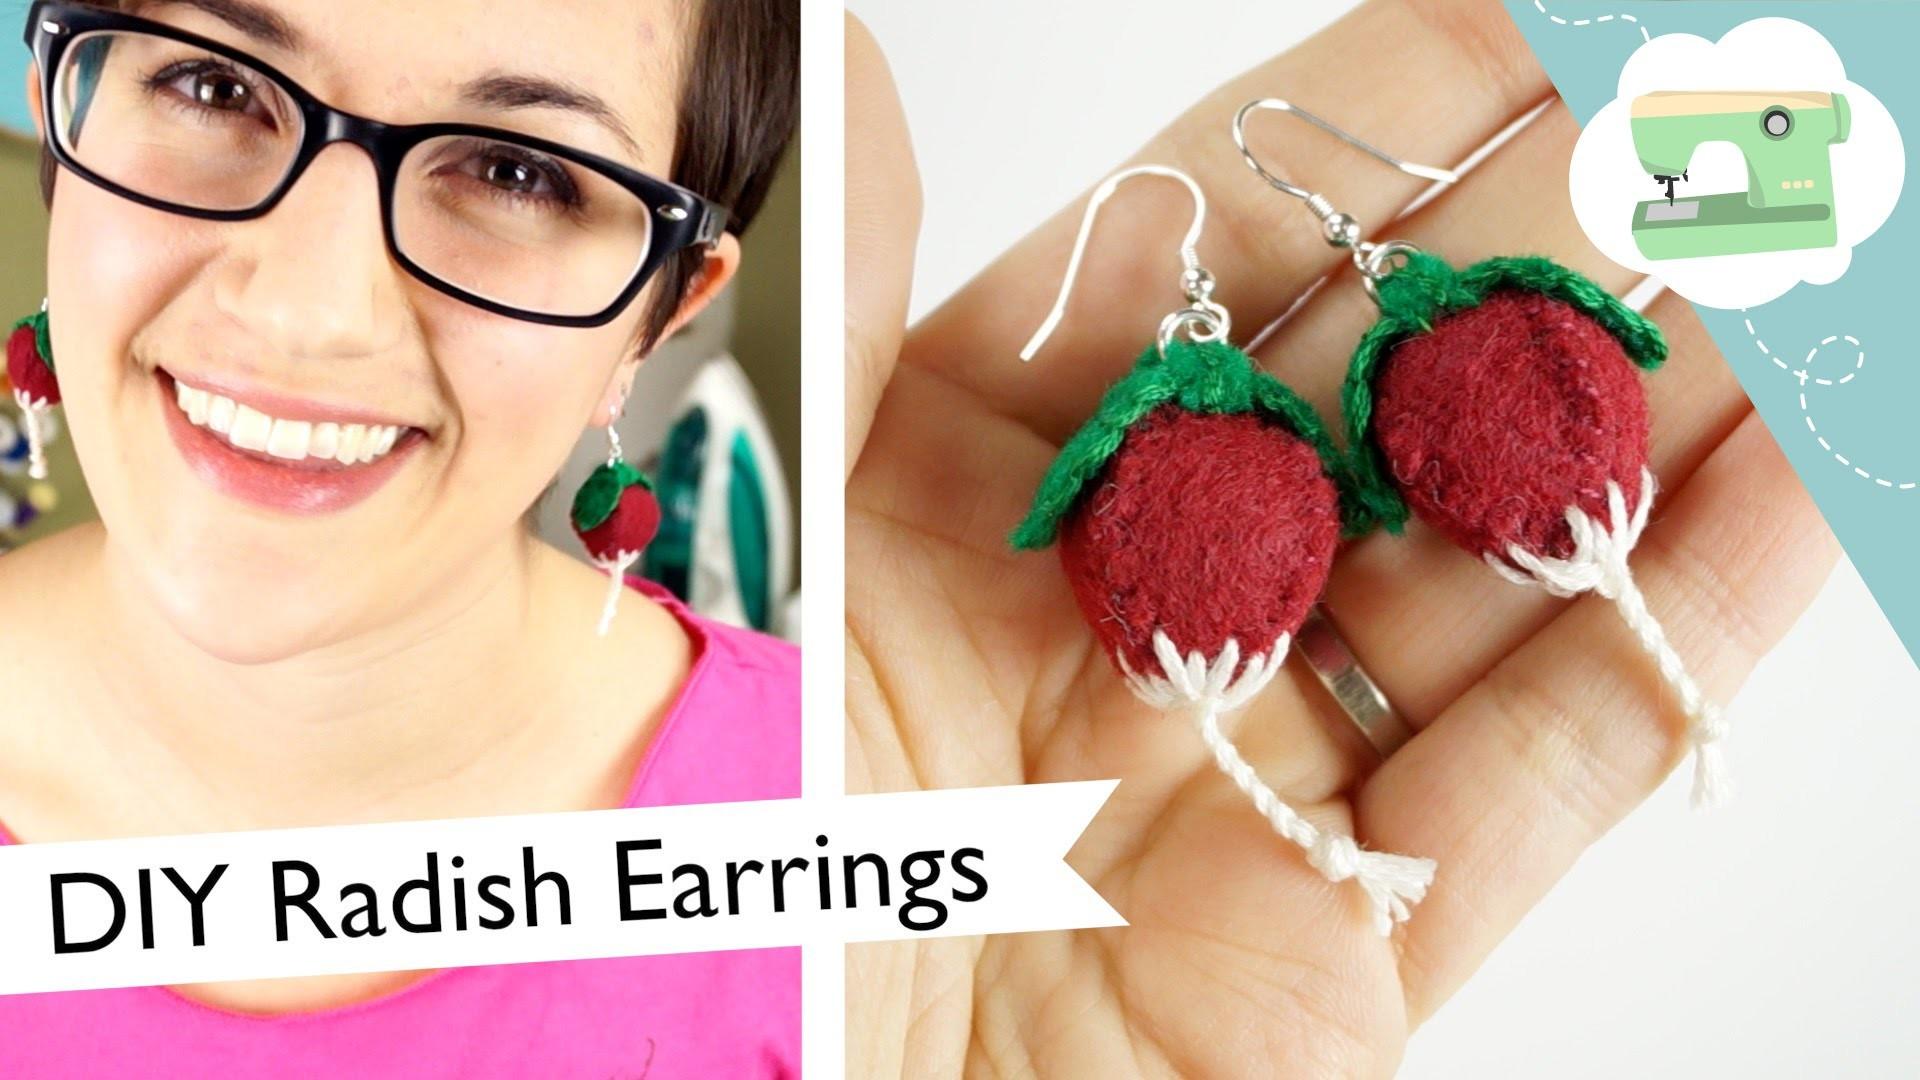 DIY Luna's Radish Earrings (collab with NerdECrafter)